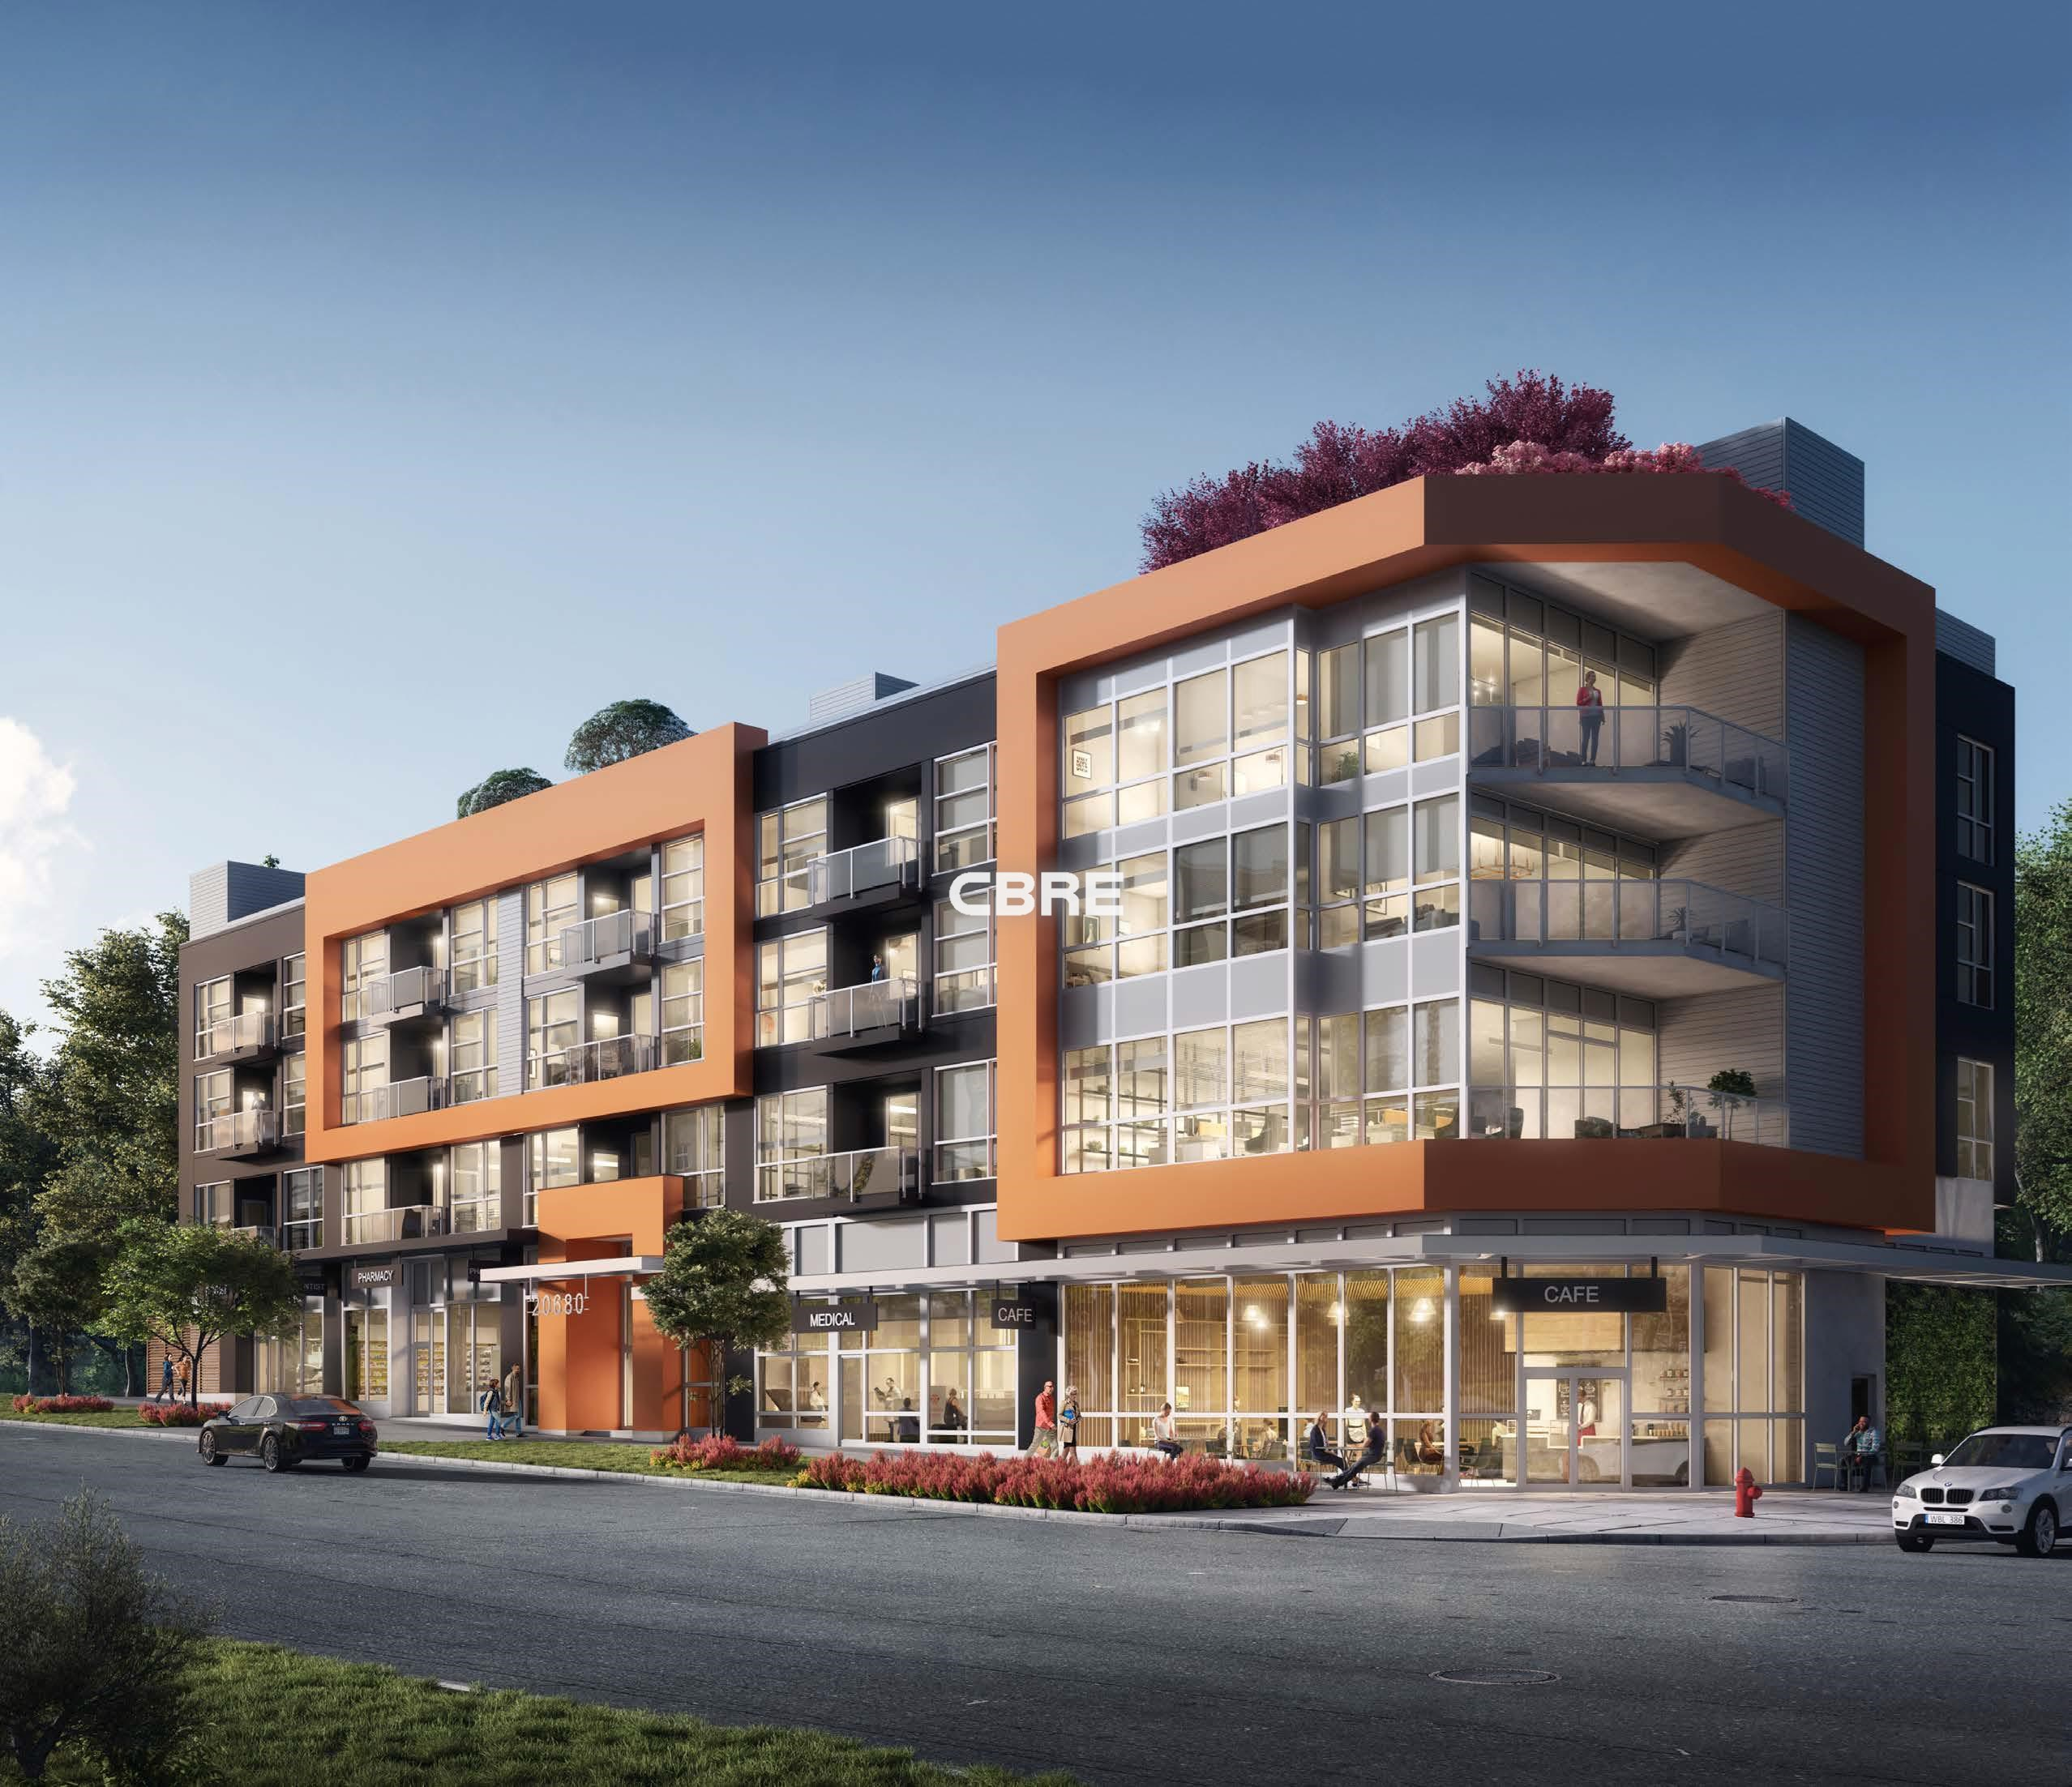 CRU 104 Yorkson Wellness & Residence 20680 80th Avenue